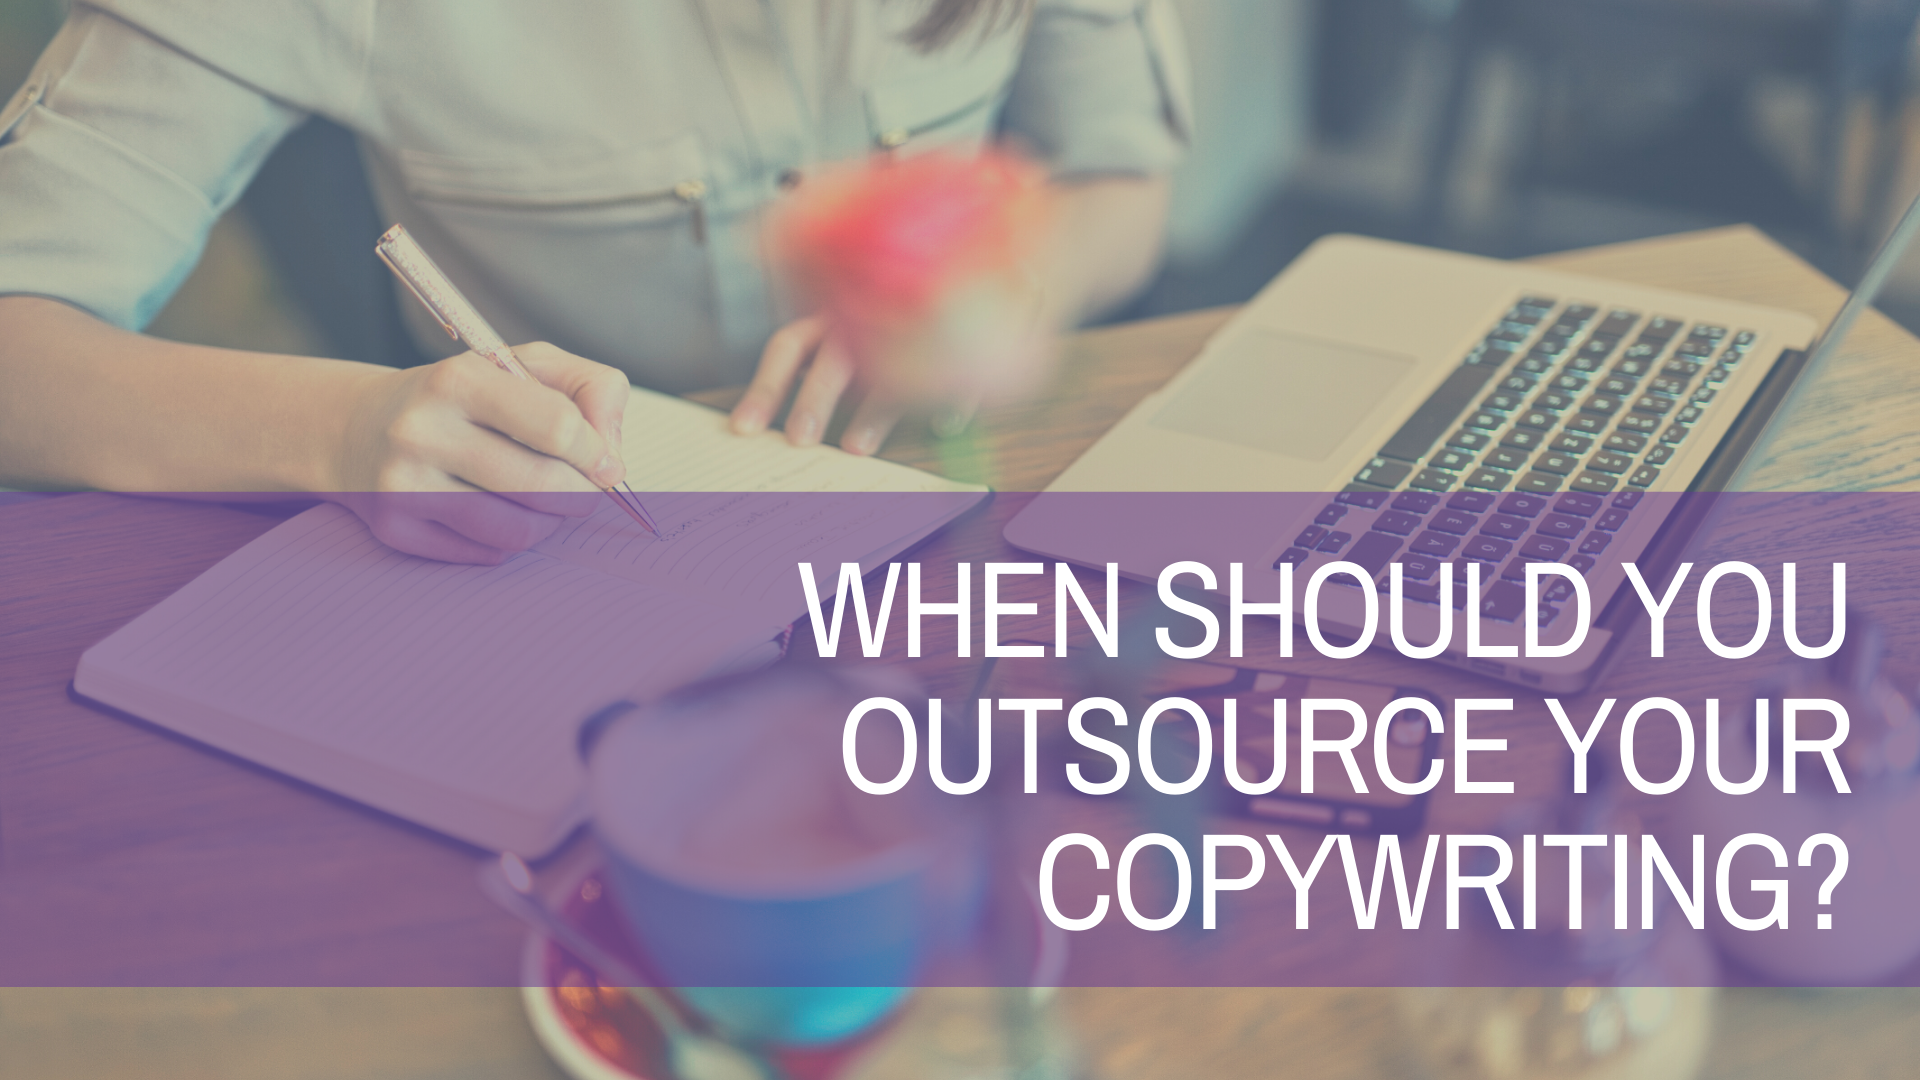 When Should You Outsource Your Copywriting?